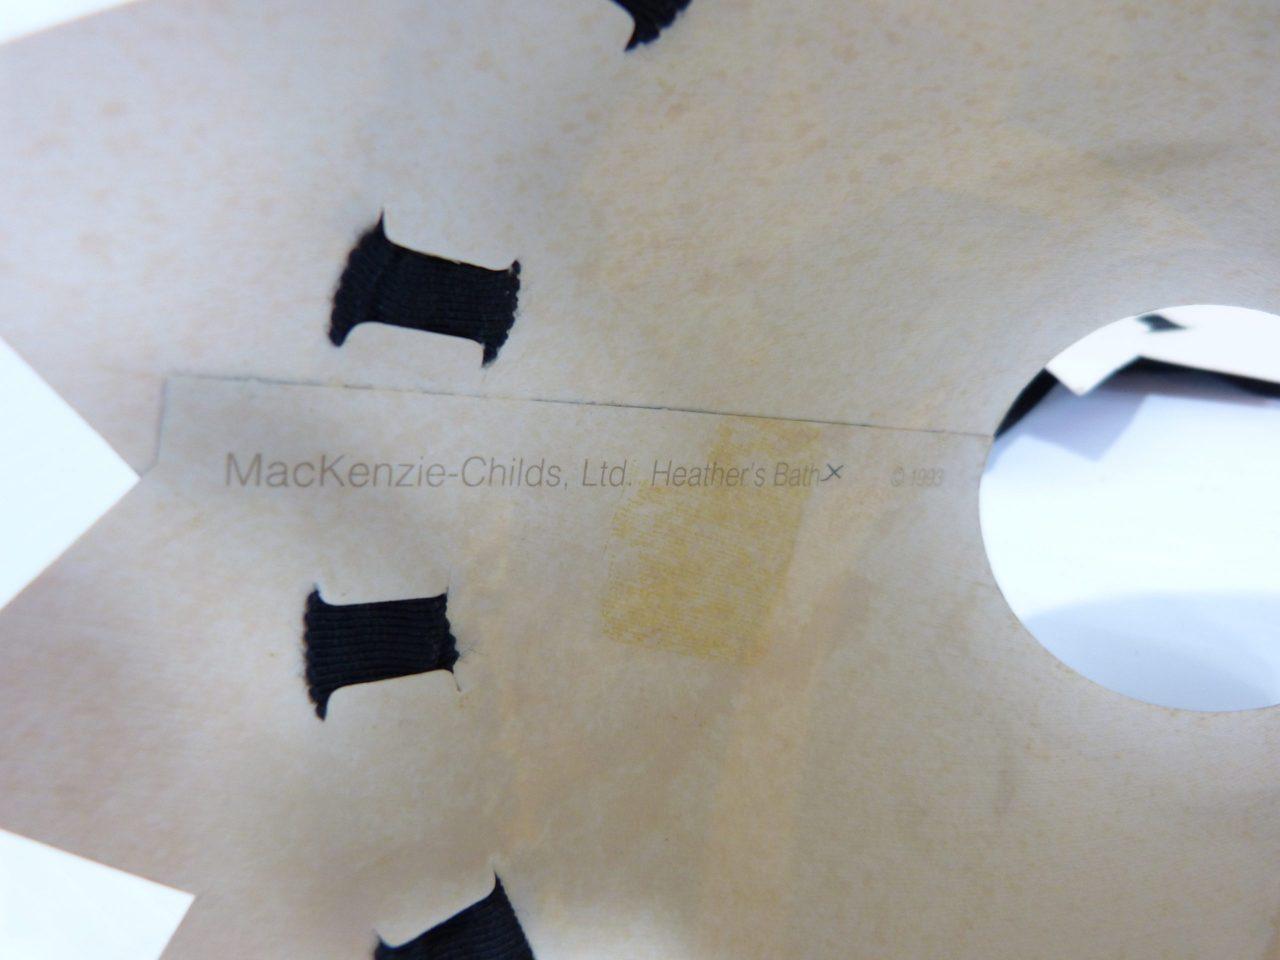 "MacKenzie Childs Paper Lamp Shades Beaded ""Heathers Bath"" 1993"